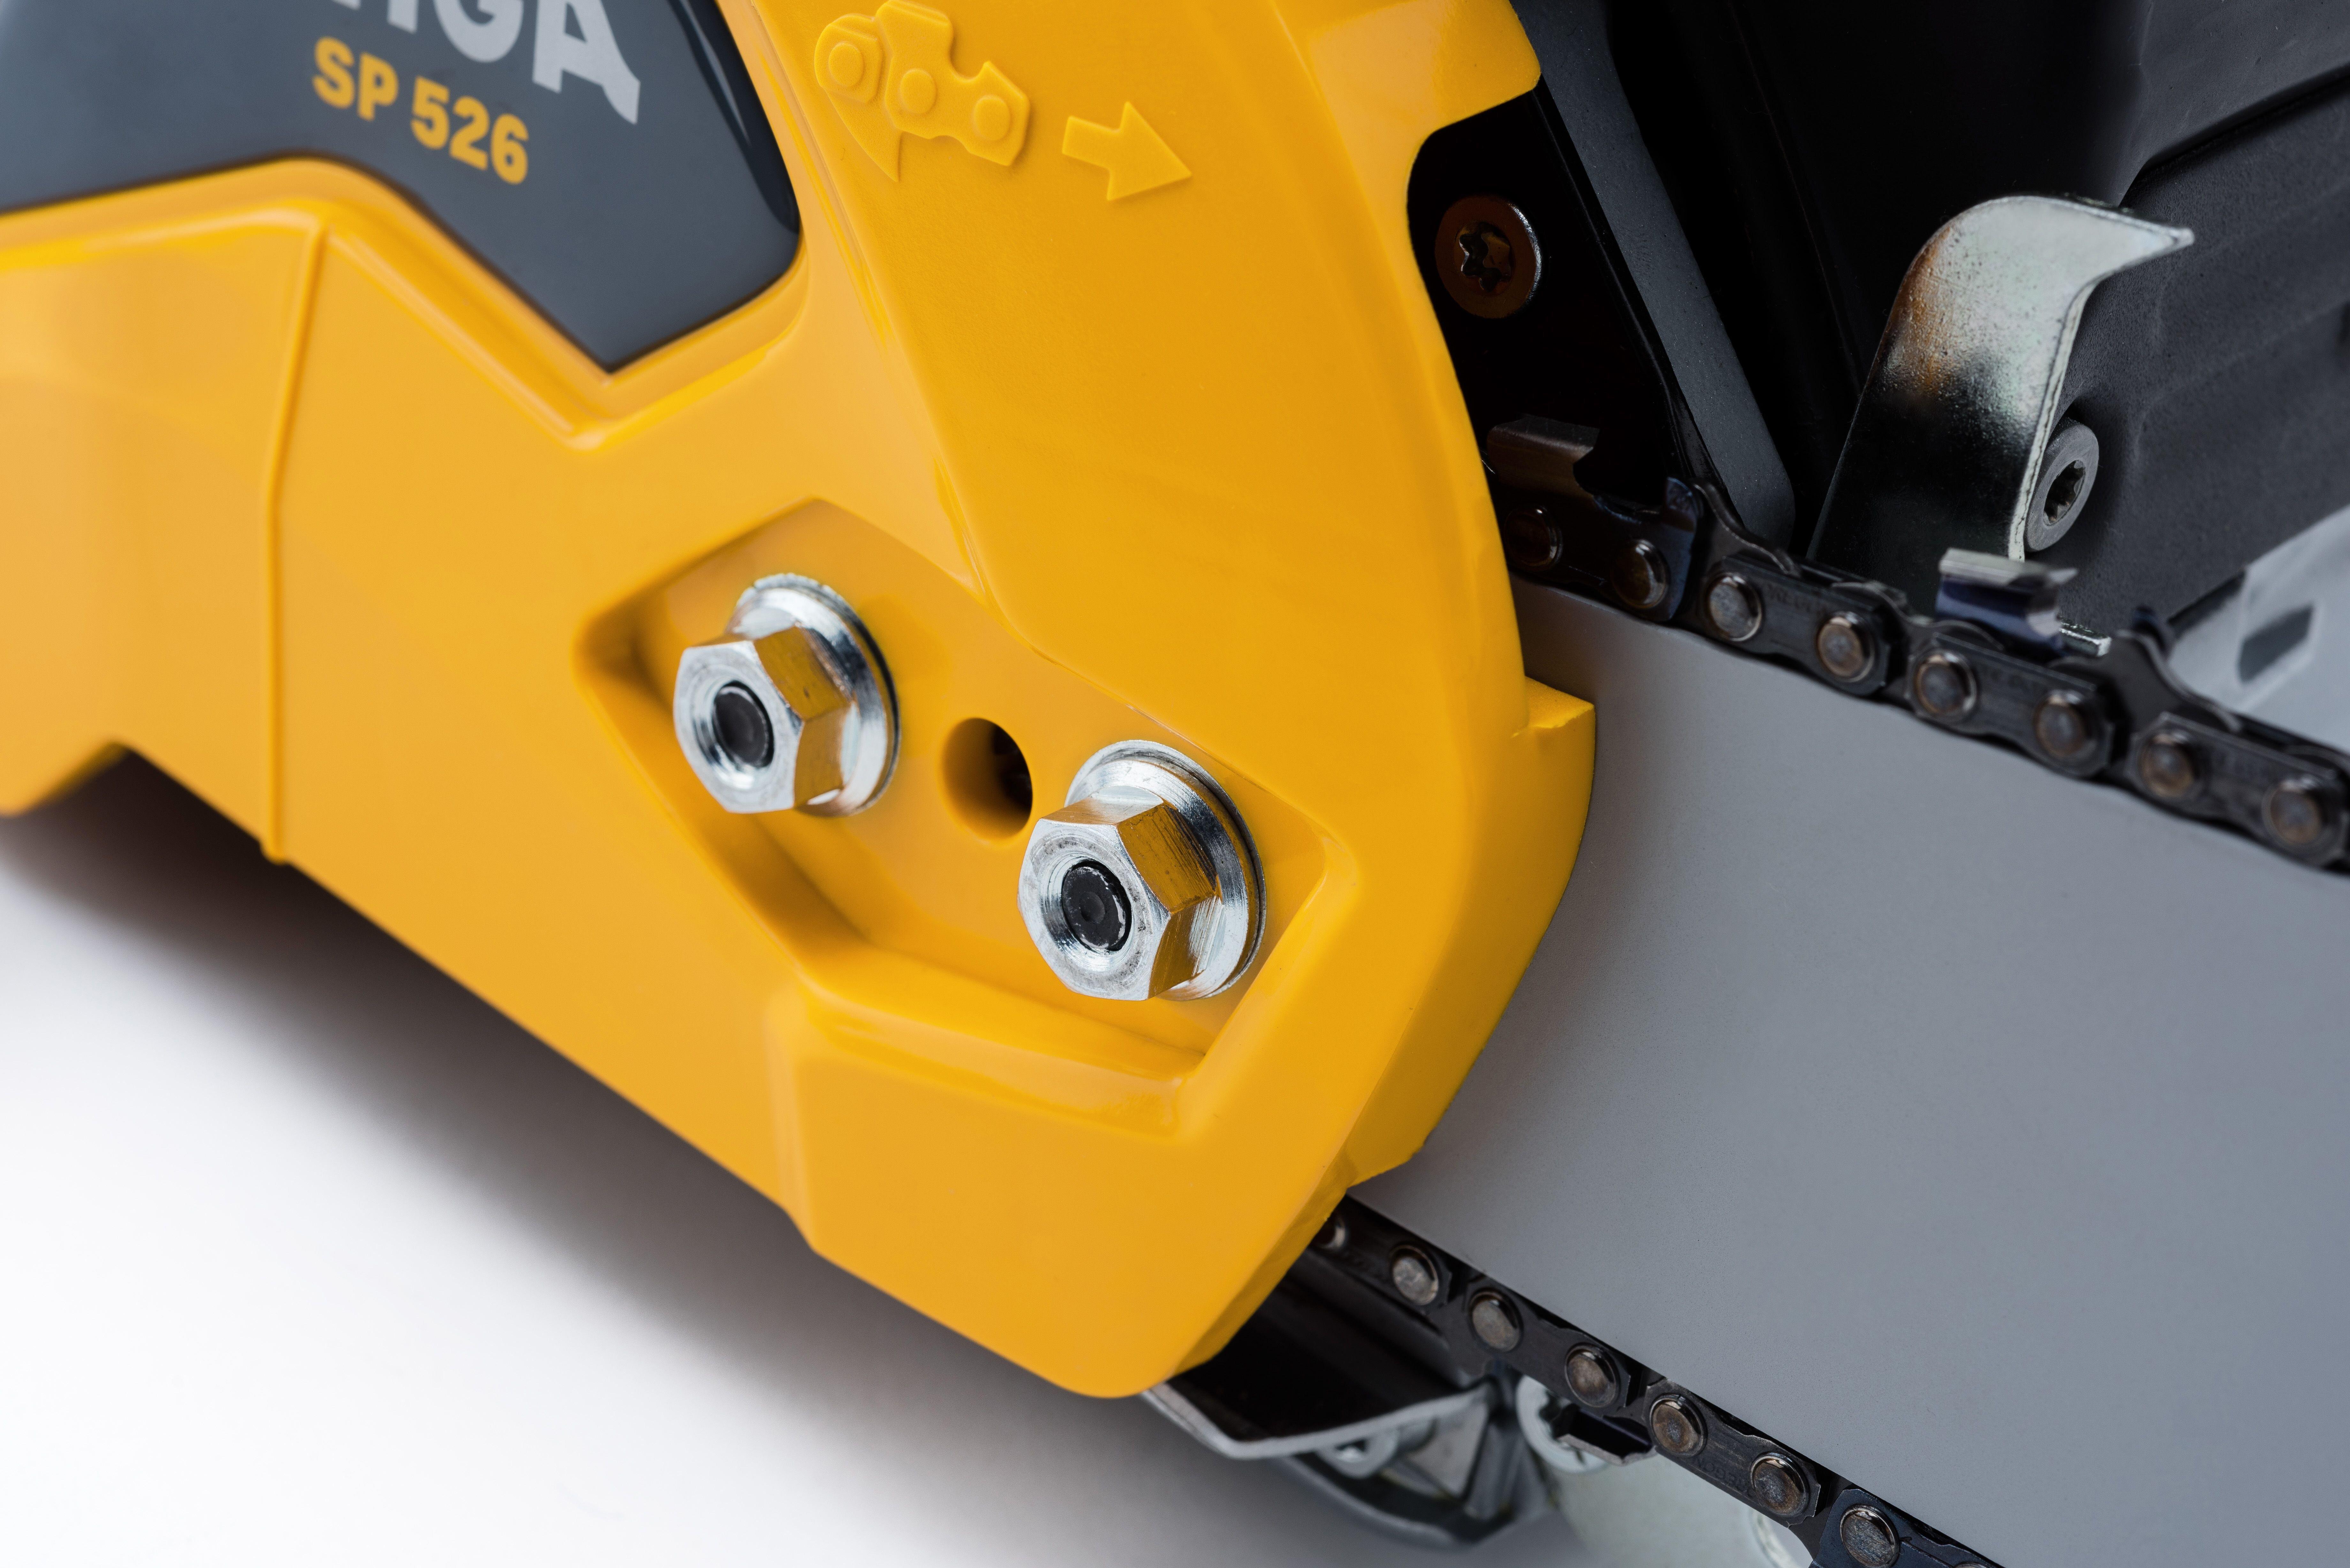 STIGA SP526 Chainsaw